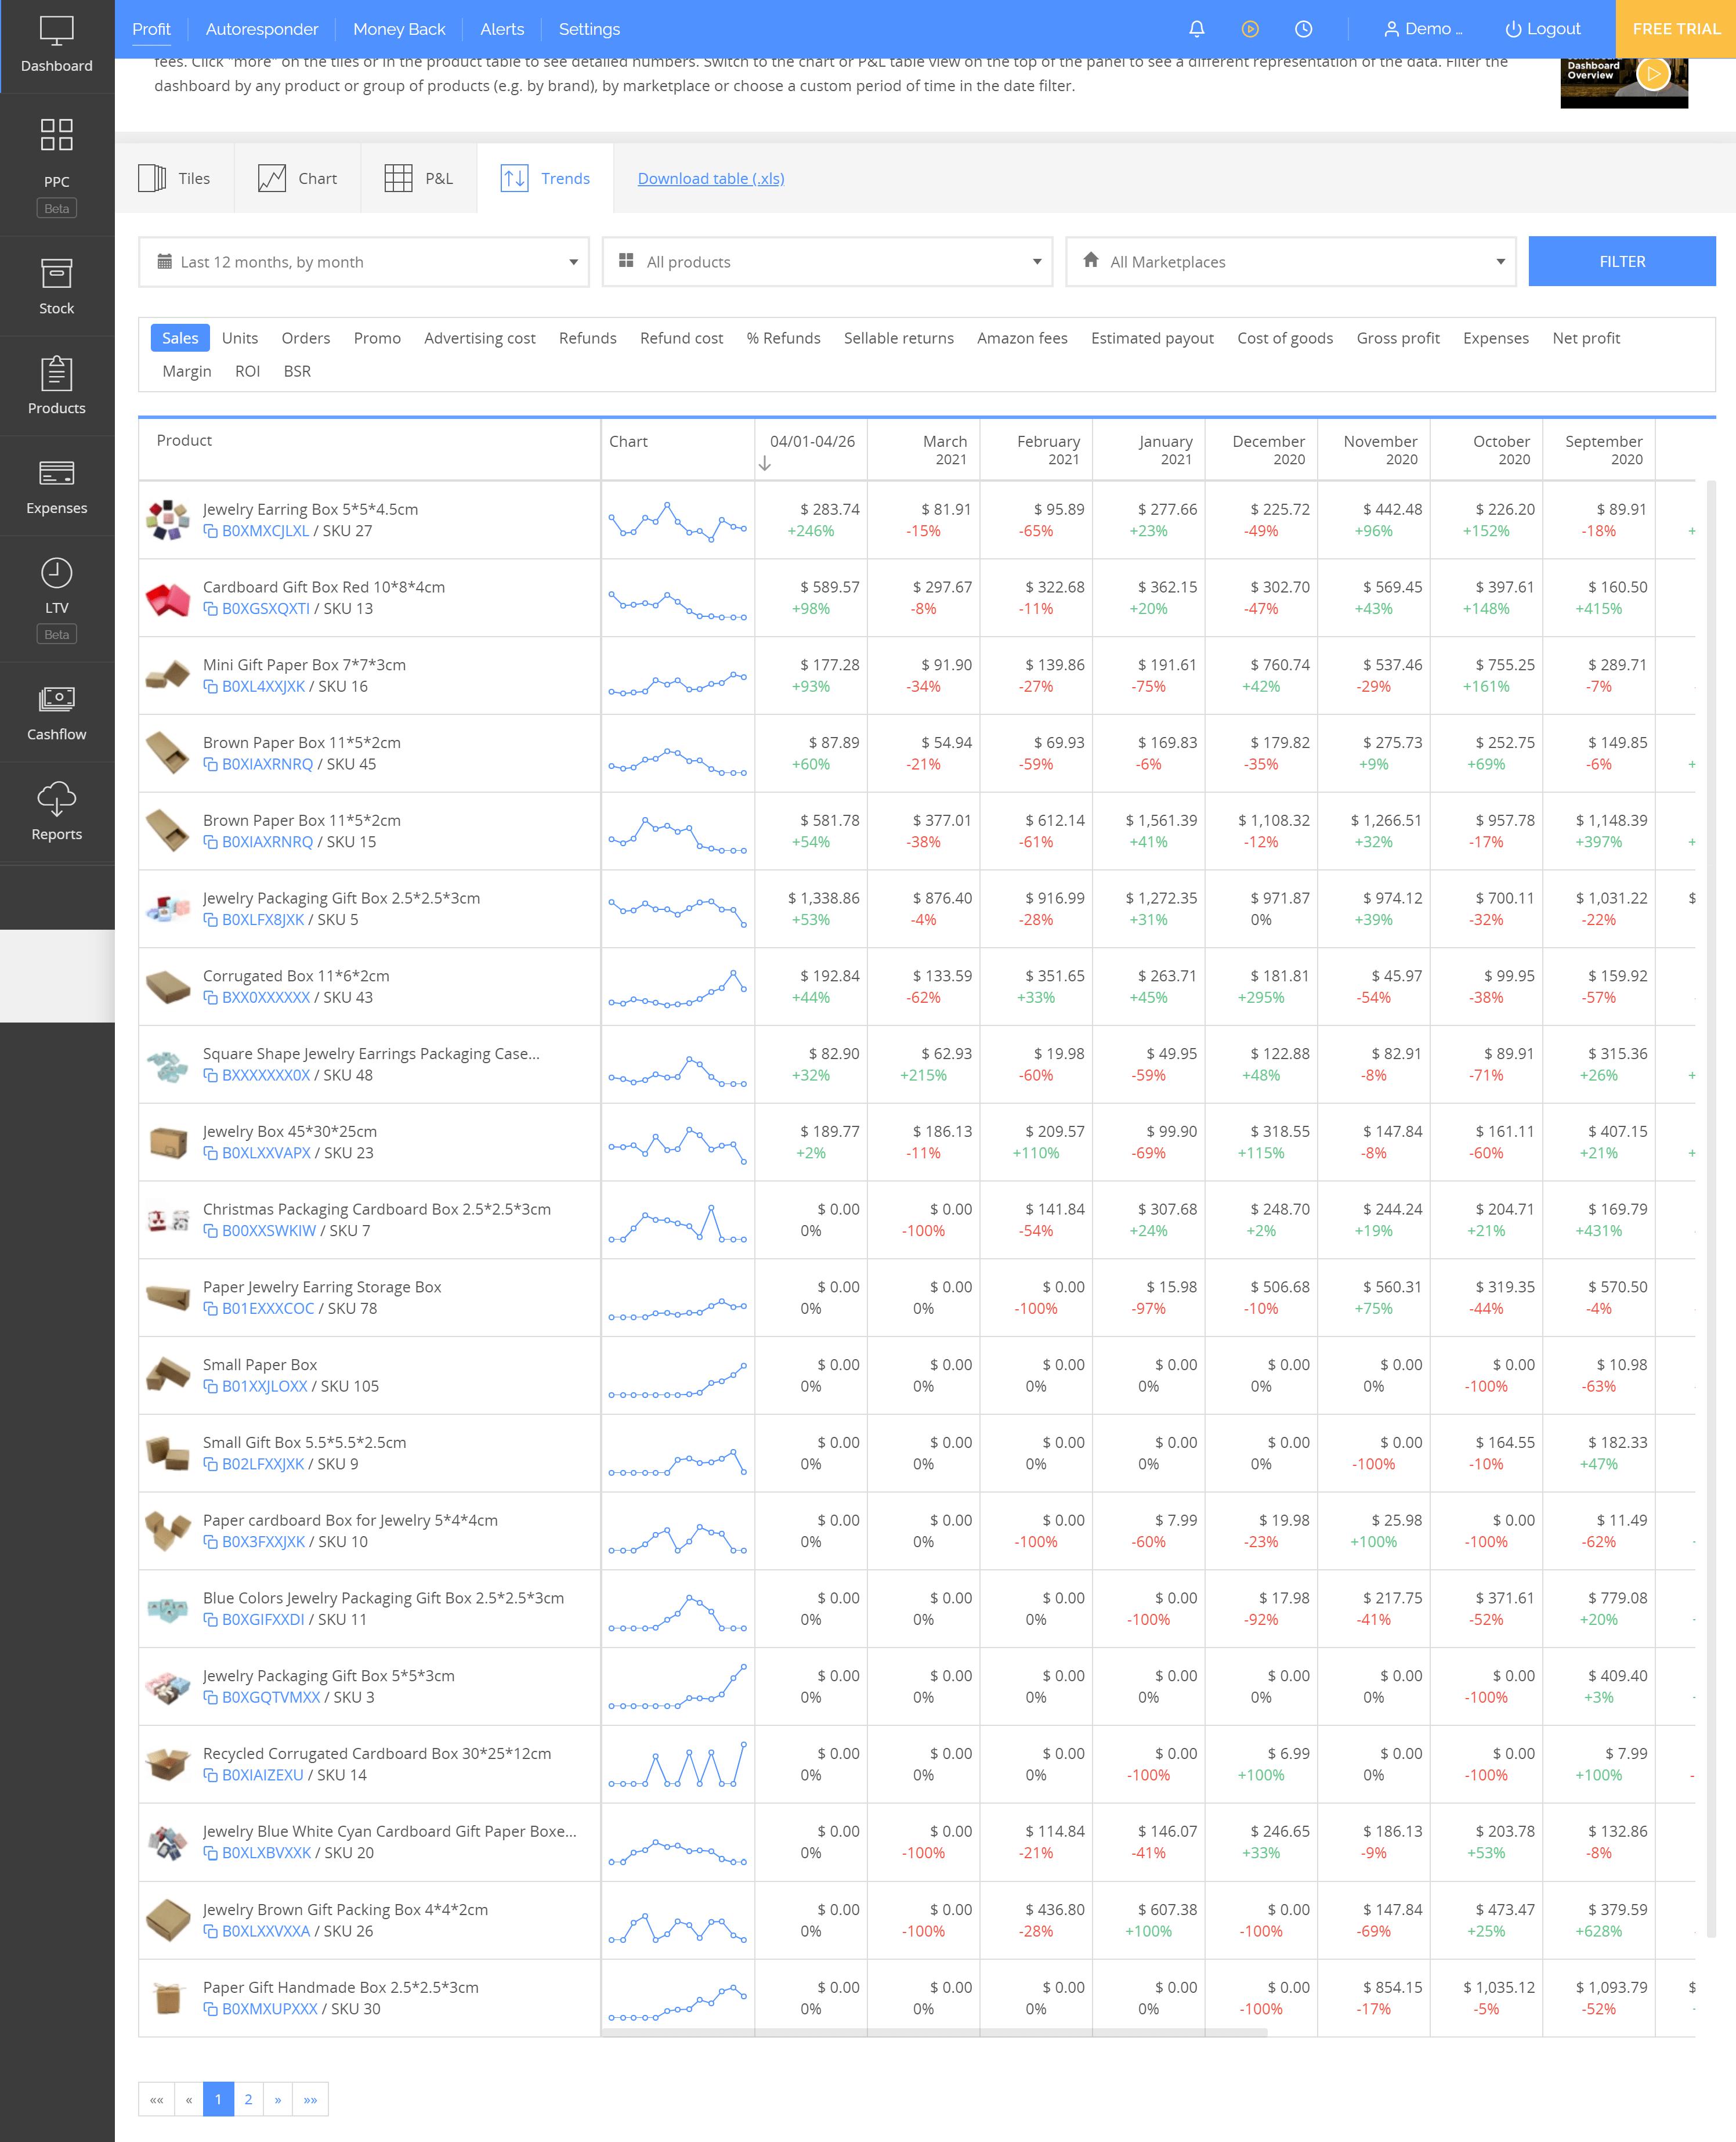 sellerboard dashboard trends